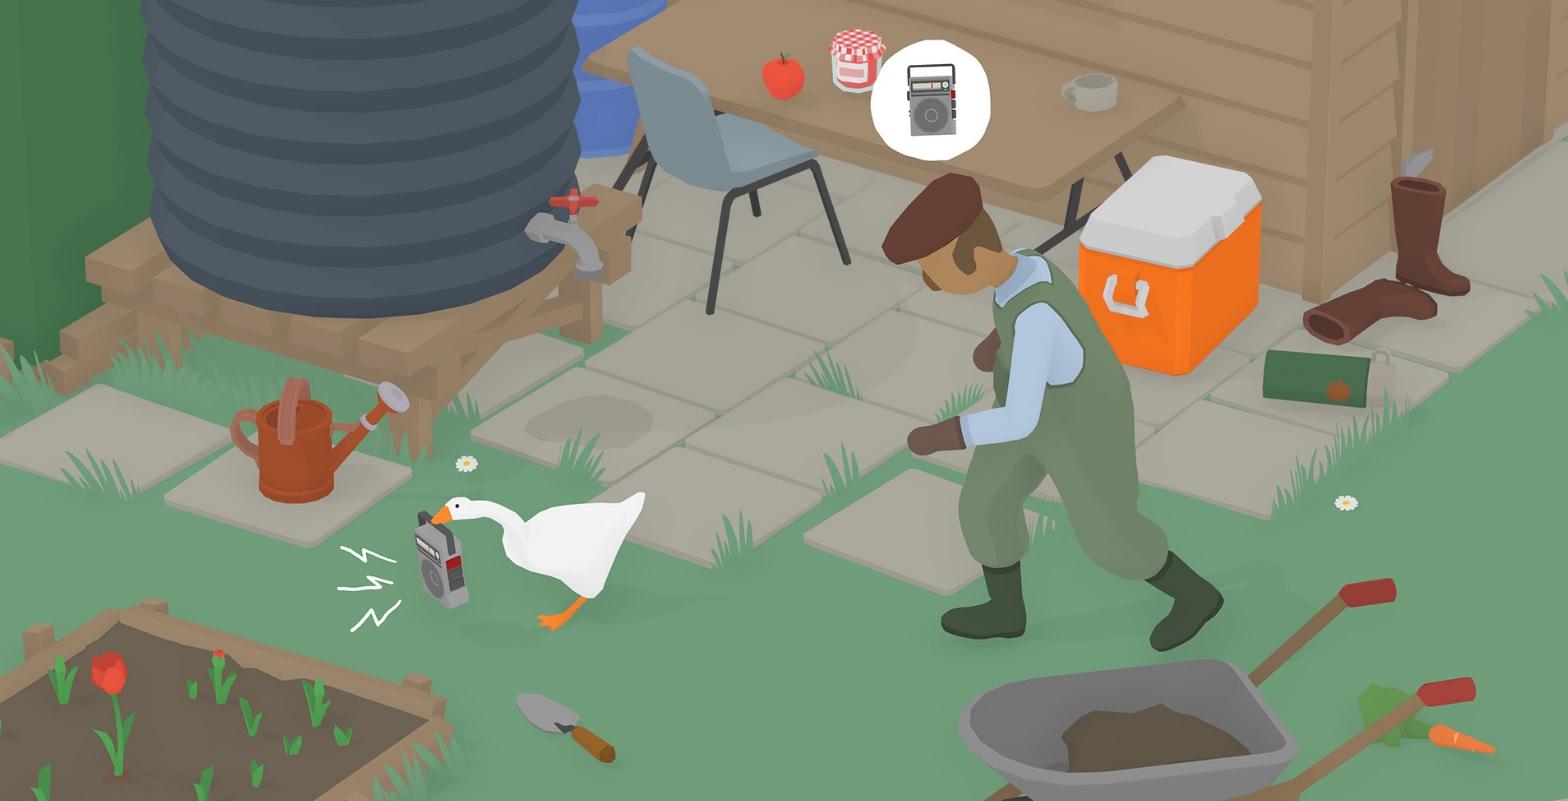 Pantalla de Untitled Goose Game